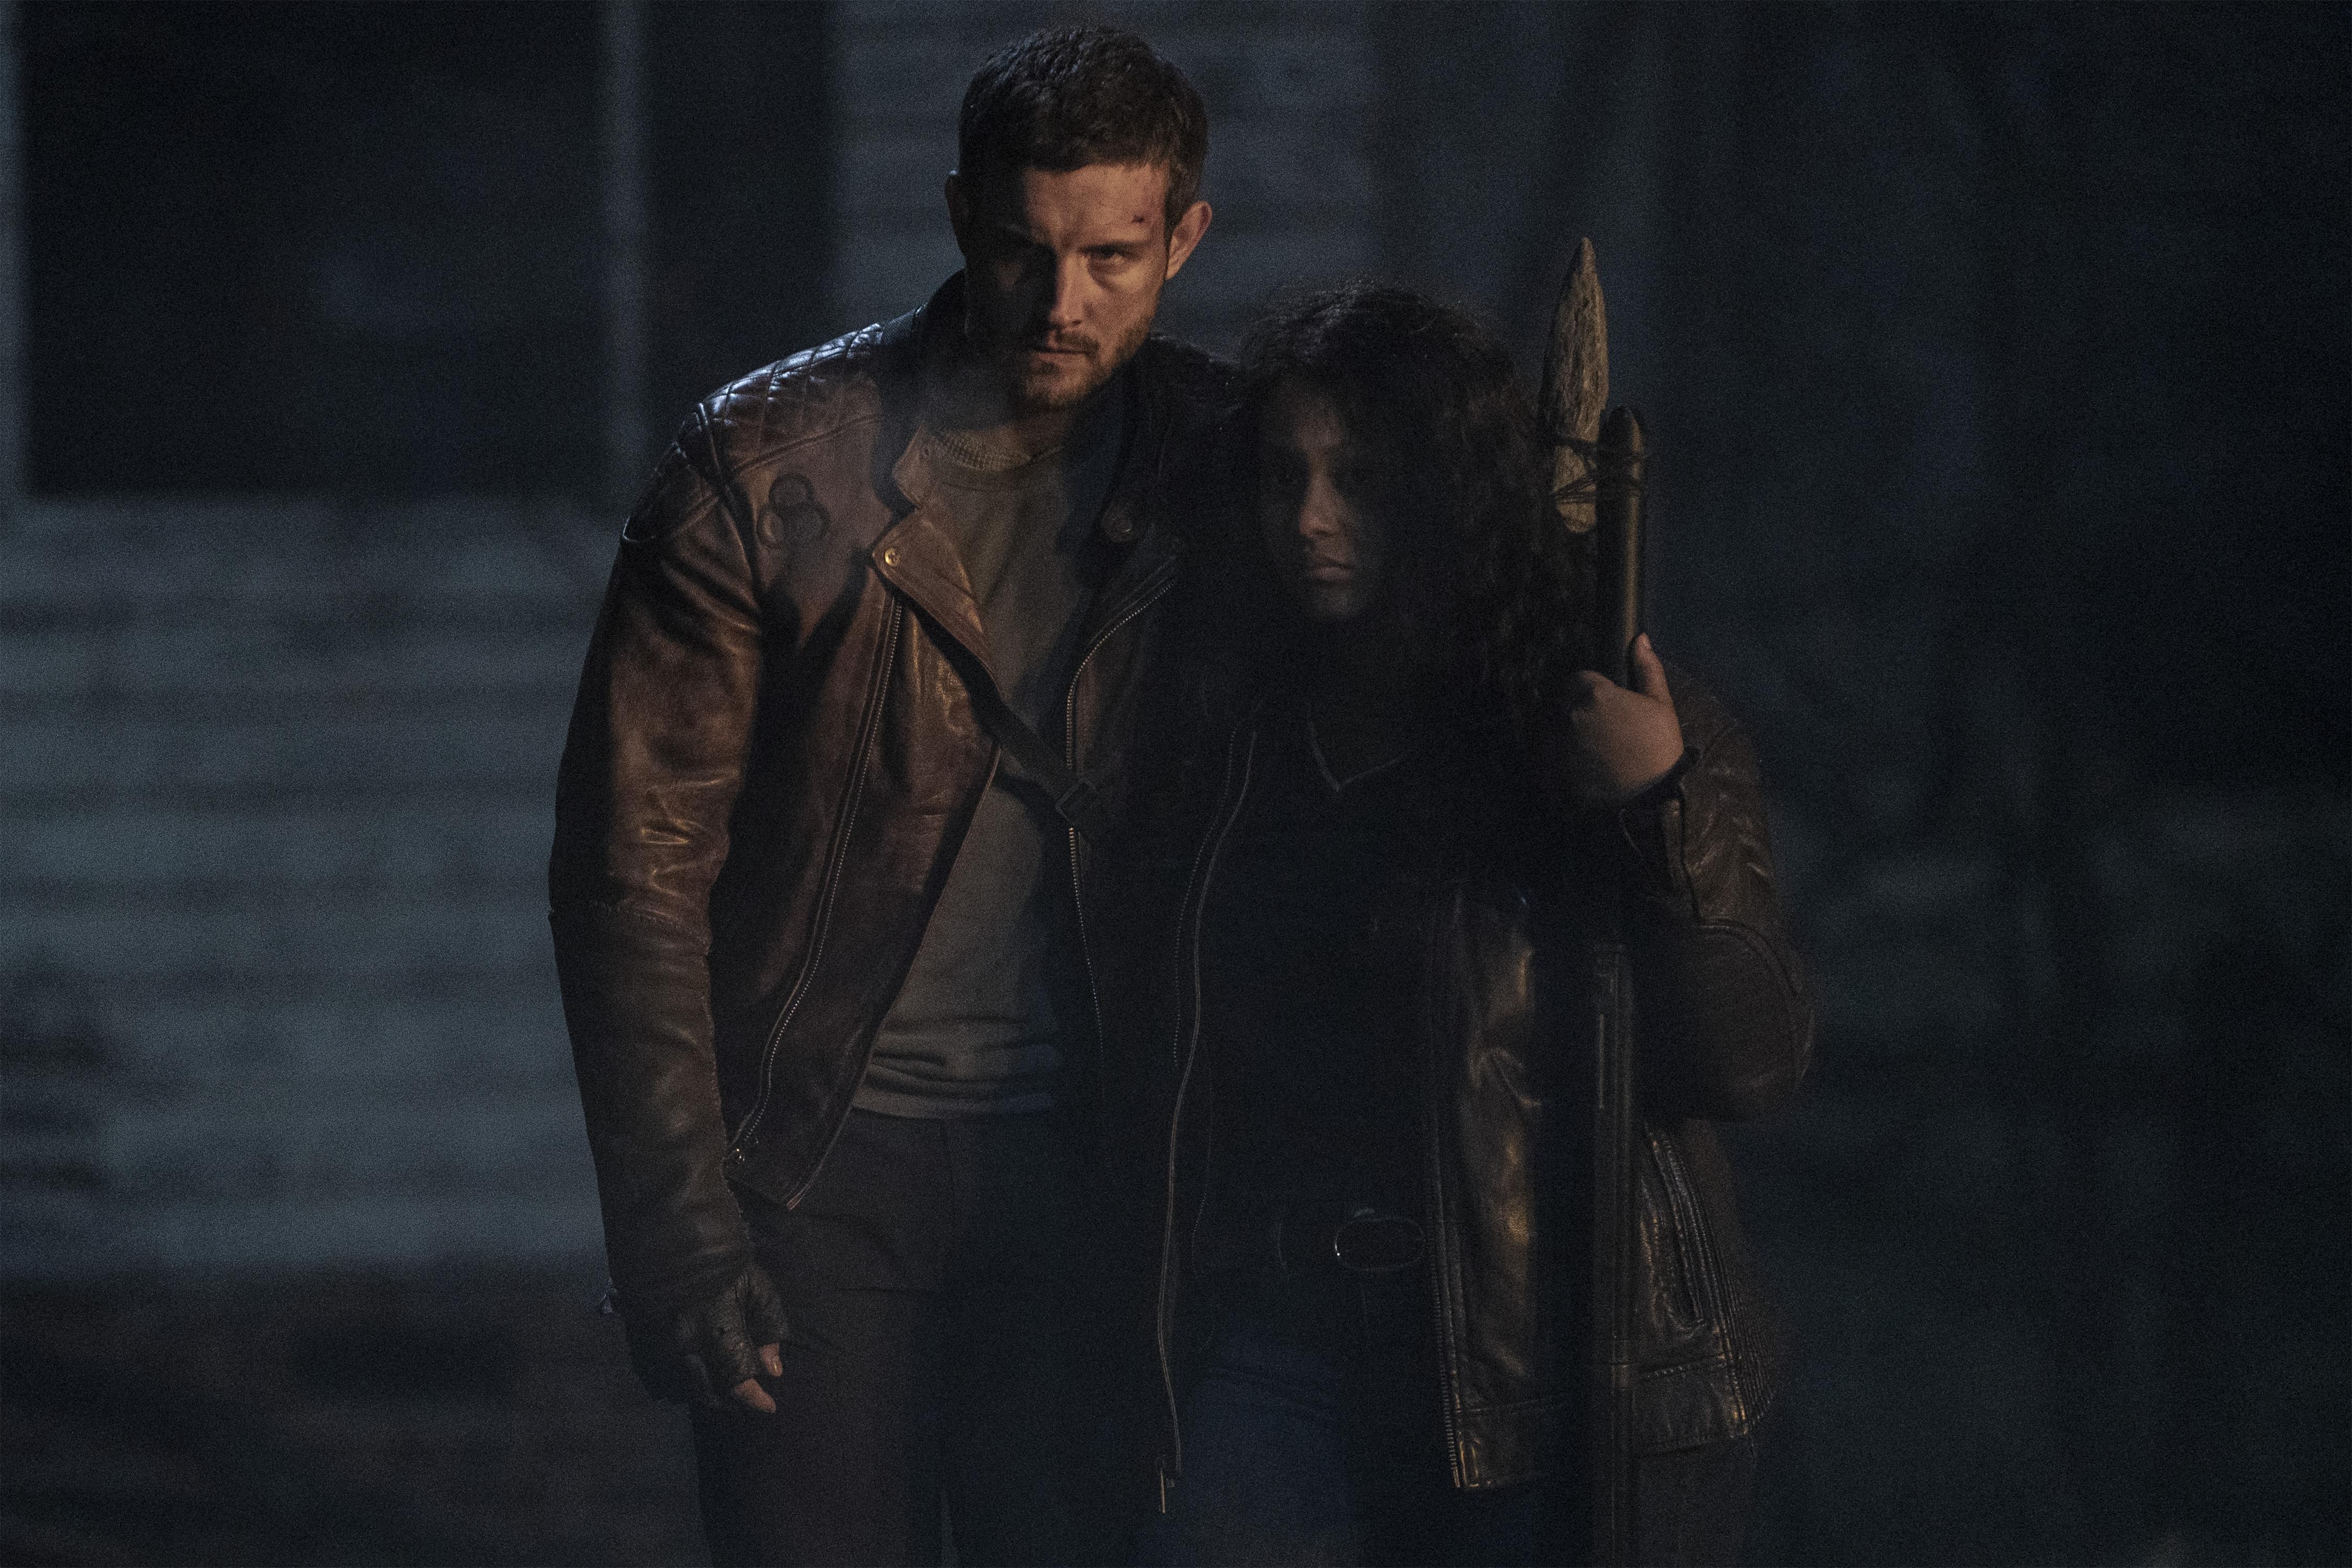 Nico Tortorella and Aliyah Royale in The Walking Dead: World Beyond (2020)